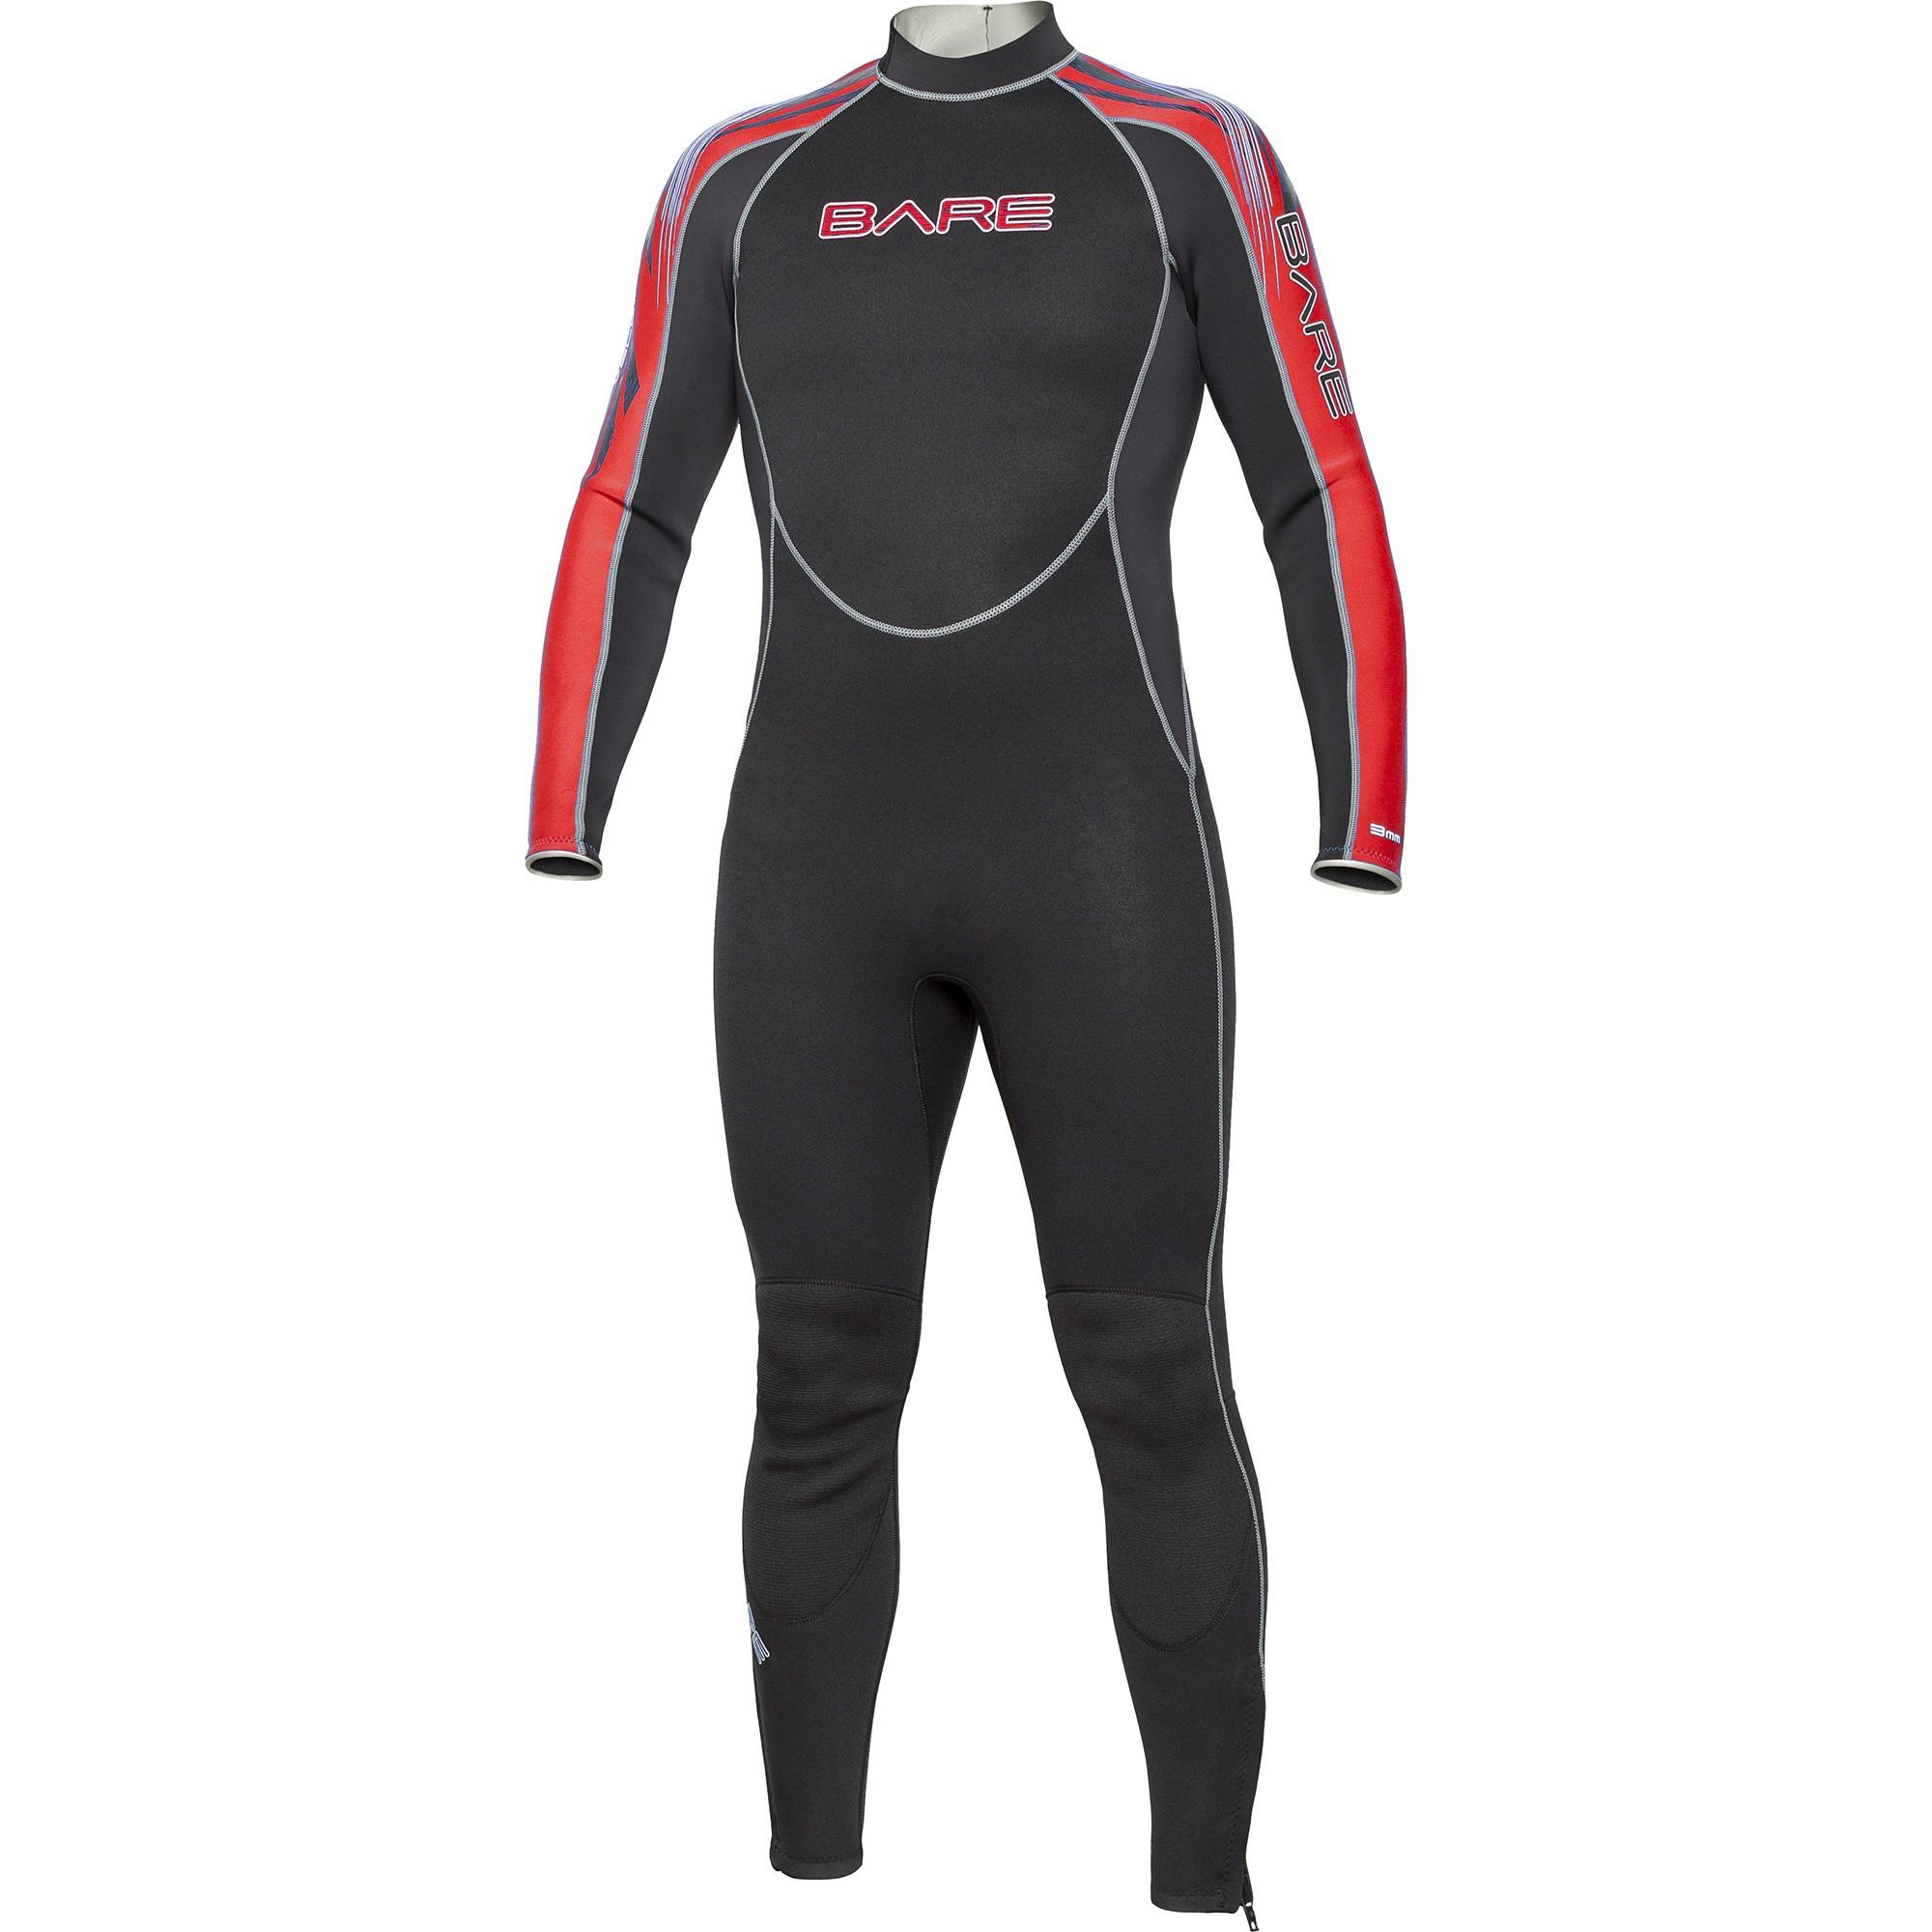 BARE 3mm Velocity Full Mens Wetsuit Red